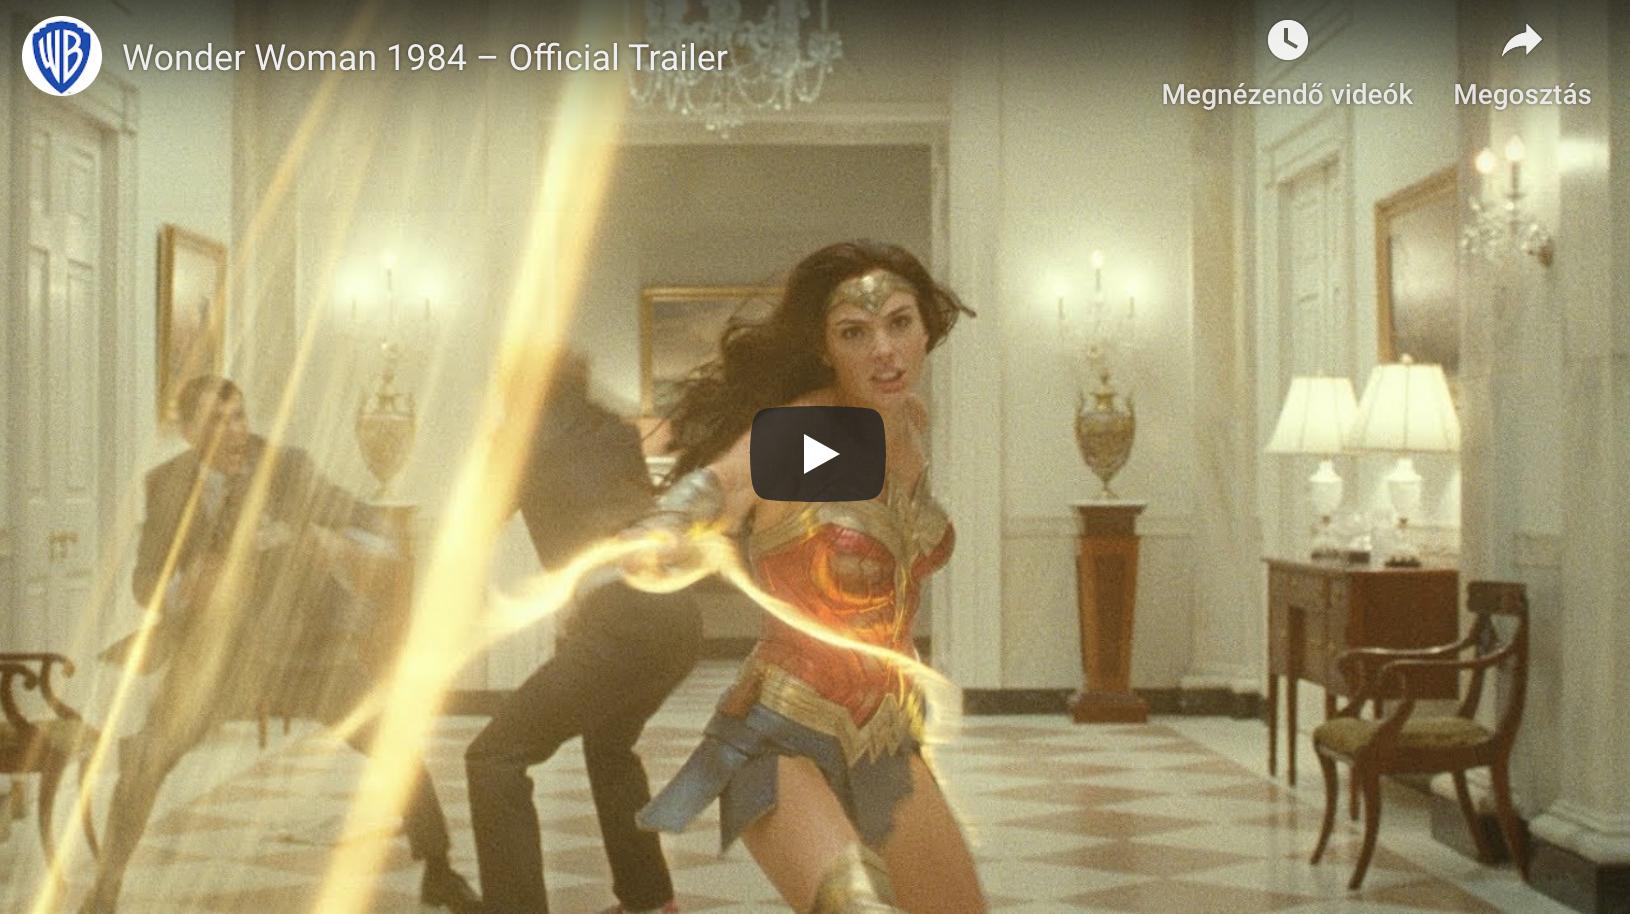 Top2 legjobb film 2020 - Wonder Woman 1984